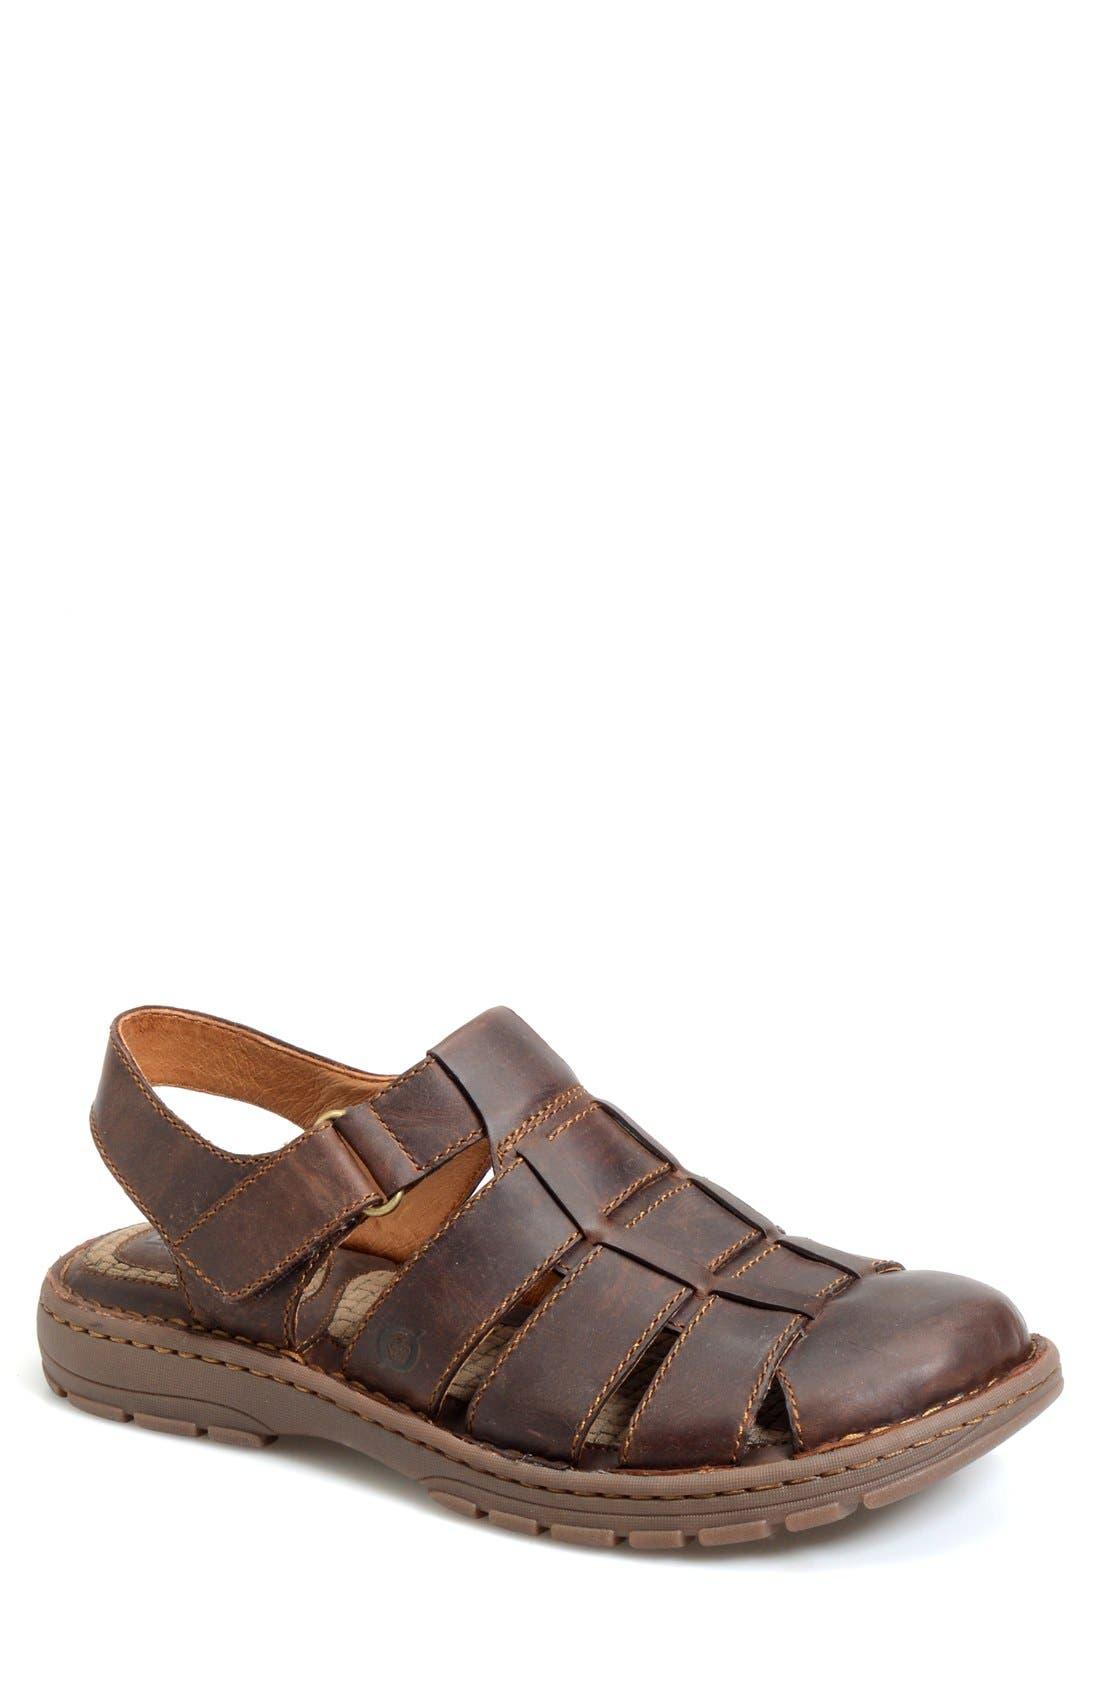 'Osmond' Leather Sandal,                         Main,                         color, Mink